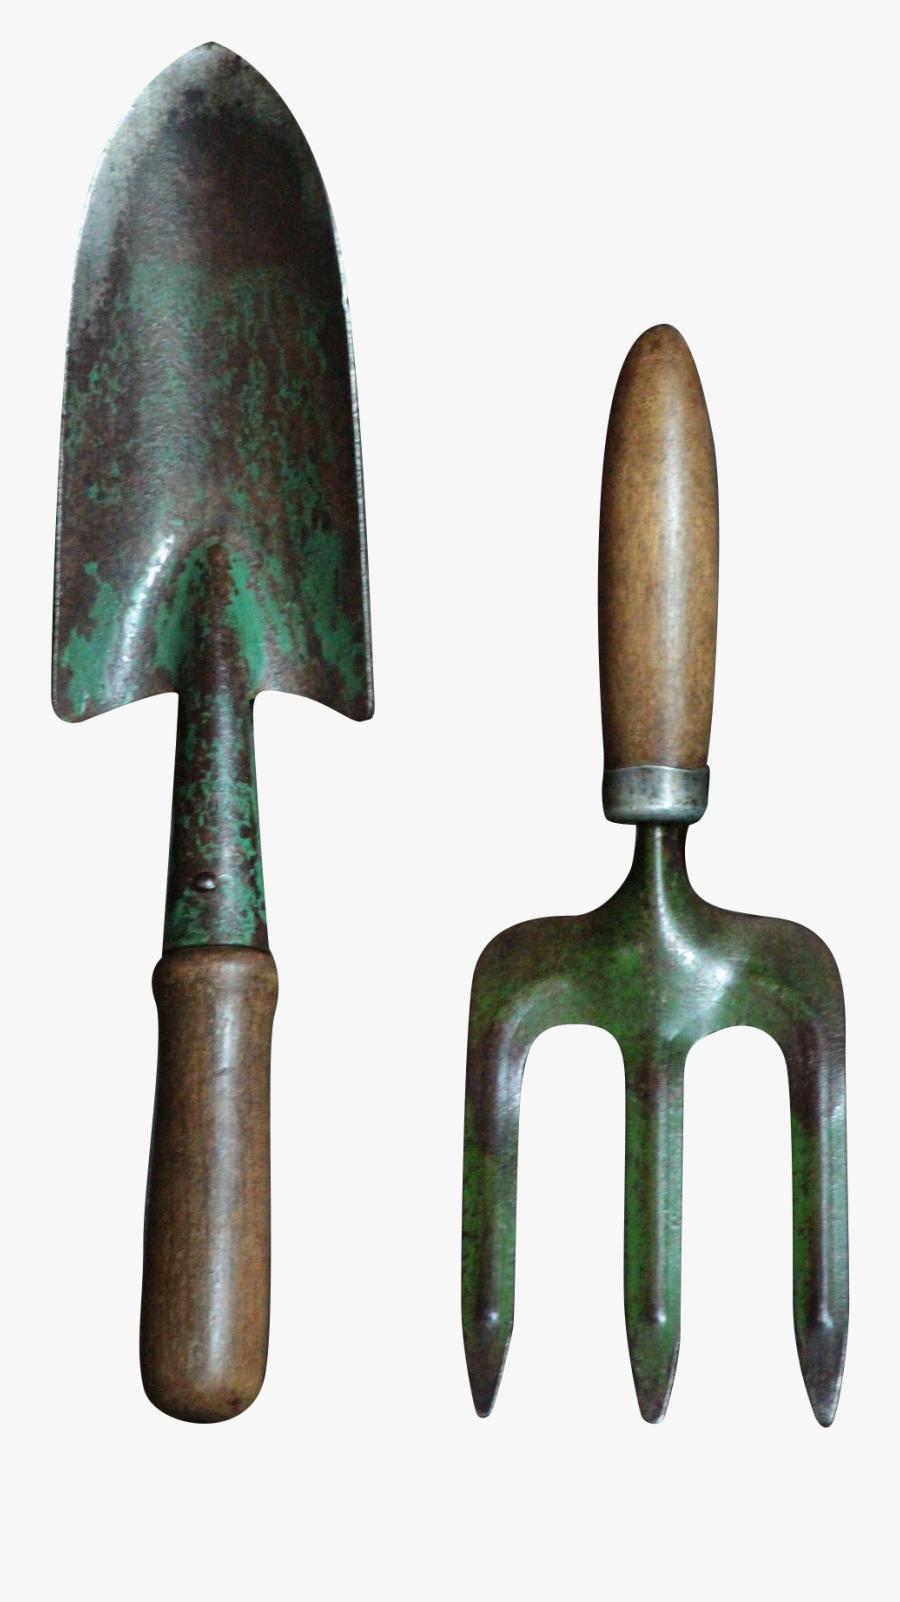 Transparent Trowel Png - Garden Hand Tool Png, Transparent Clipart